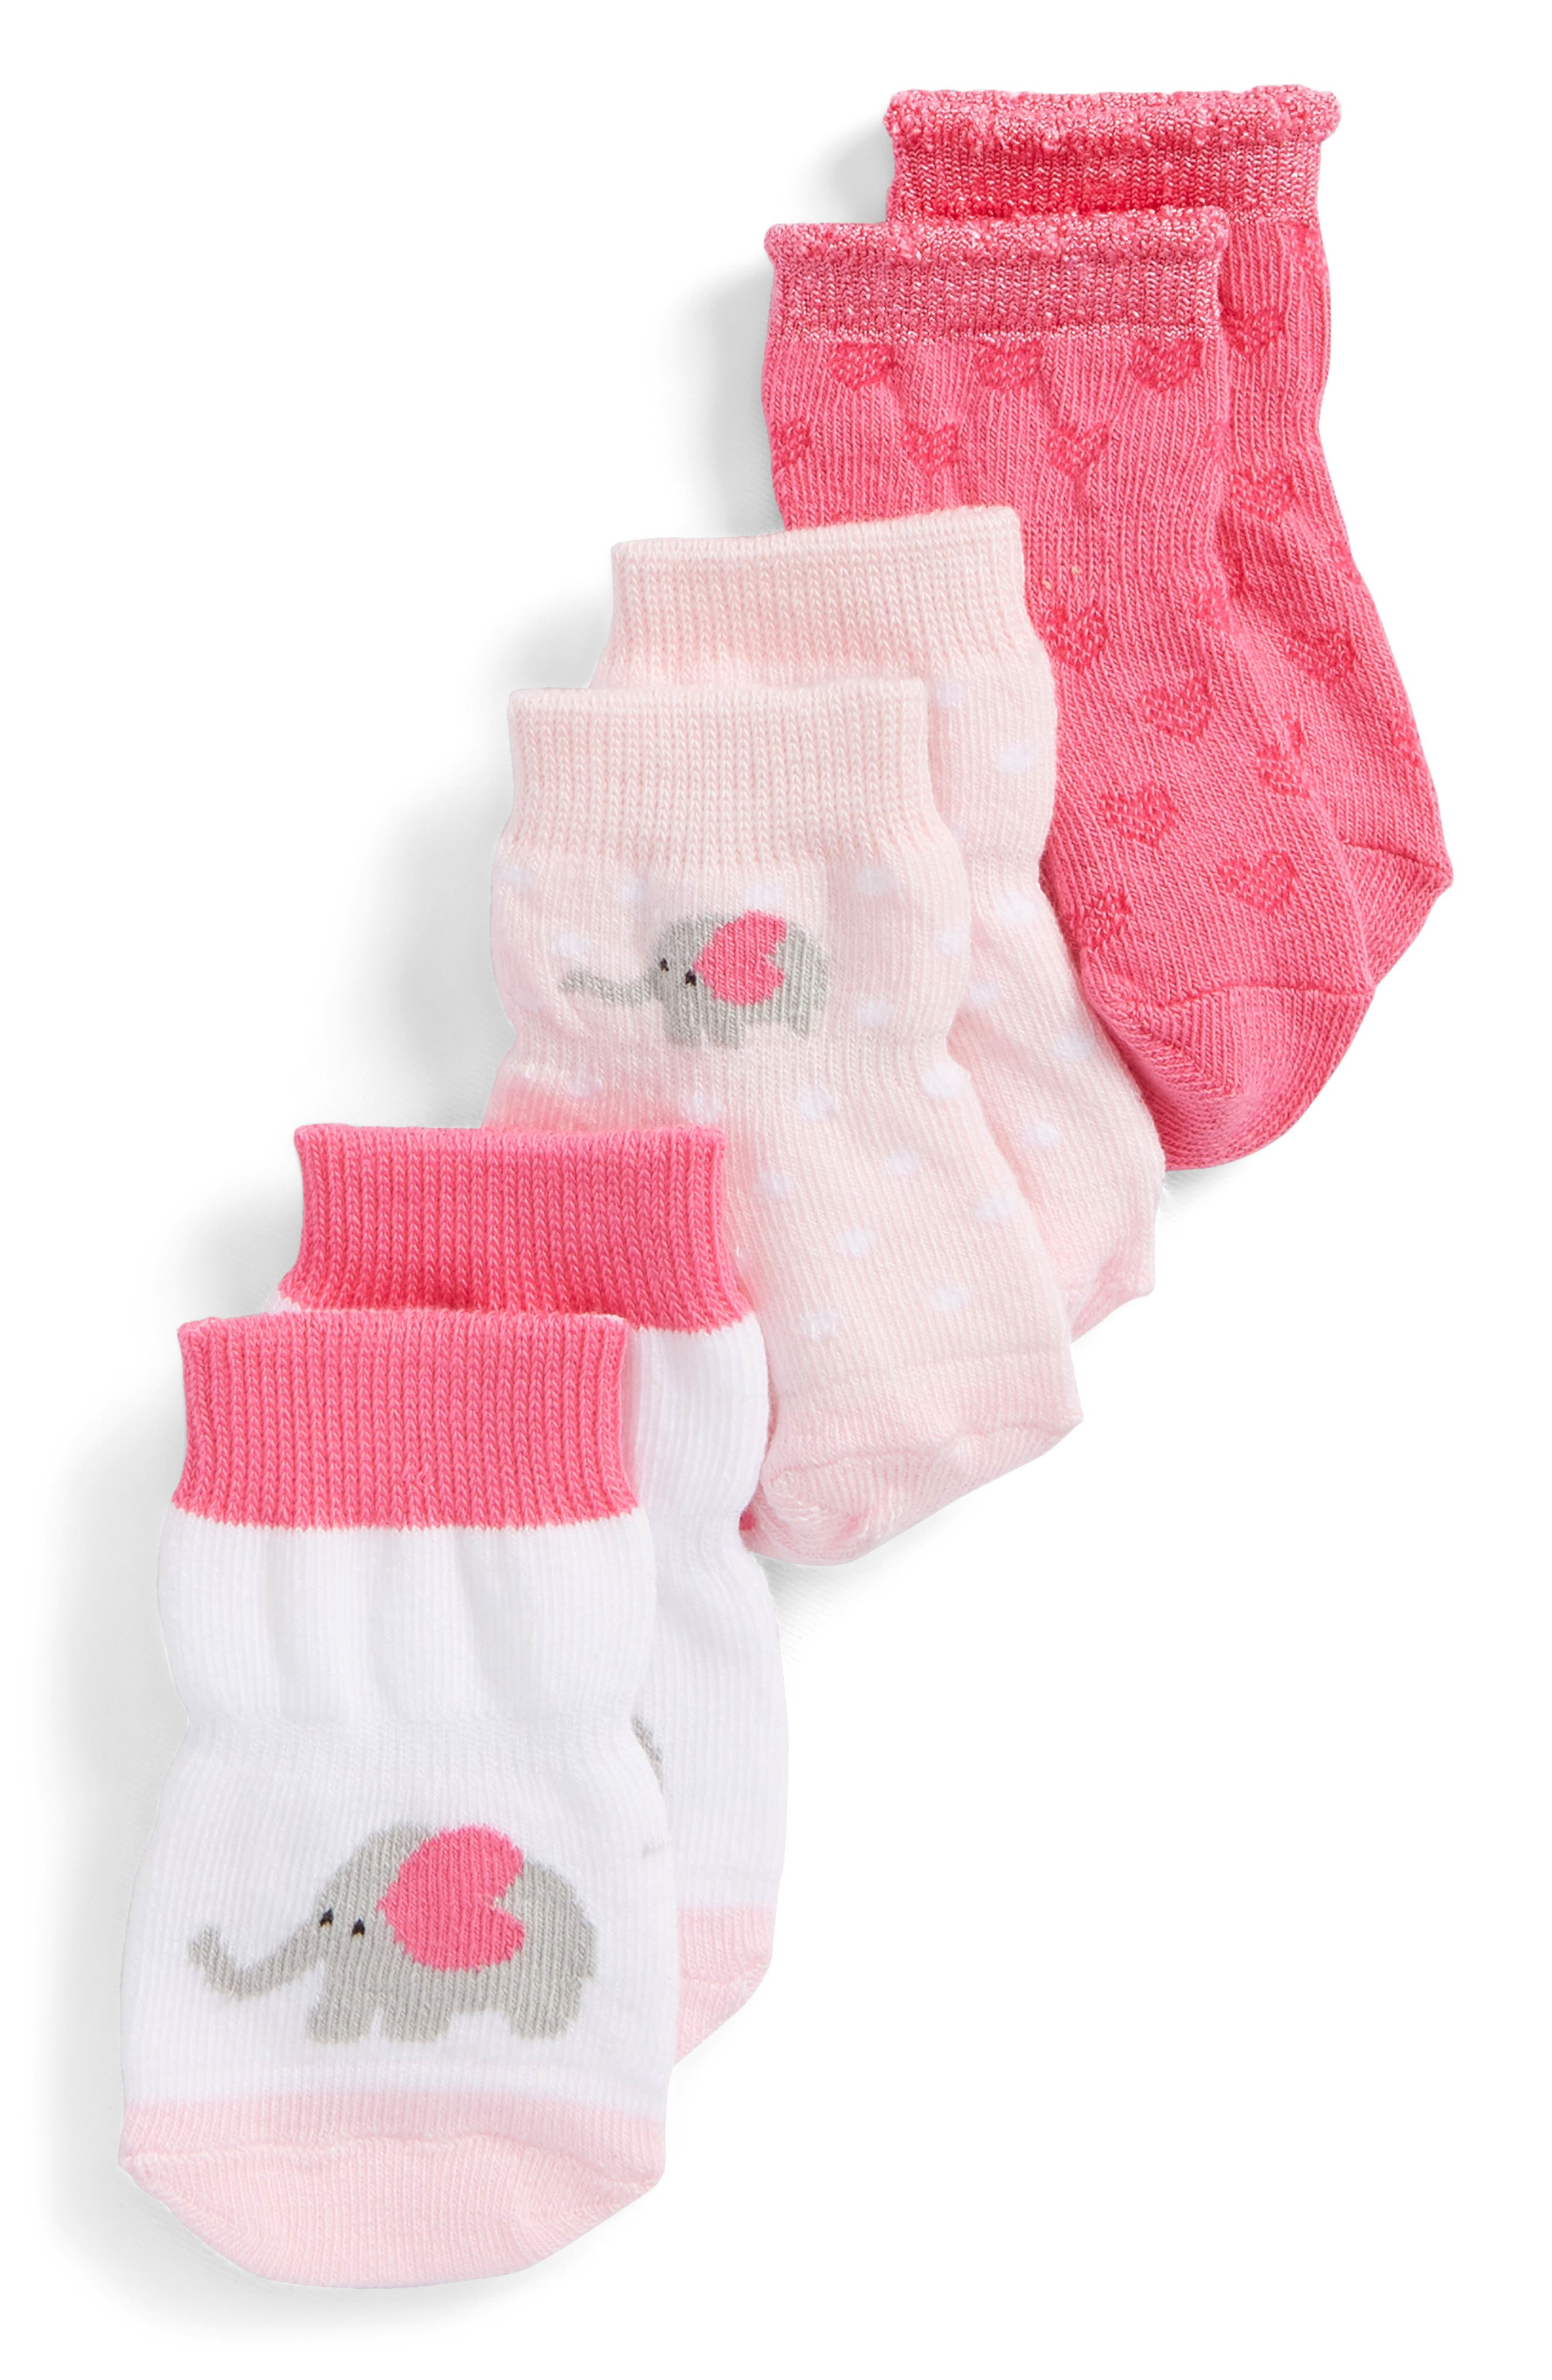 Little Peanut 3-Pack Socks,                         Main,                         color, Pink/ White